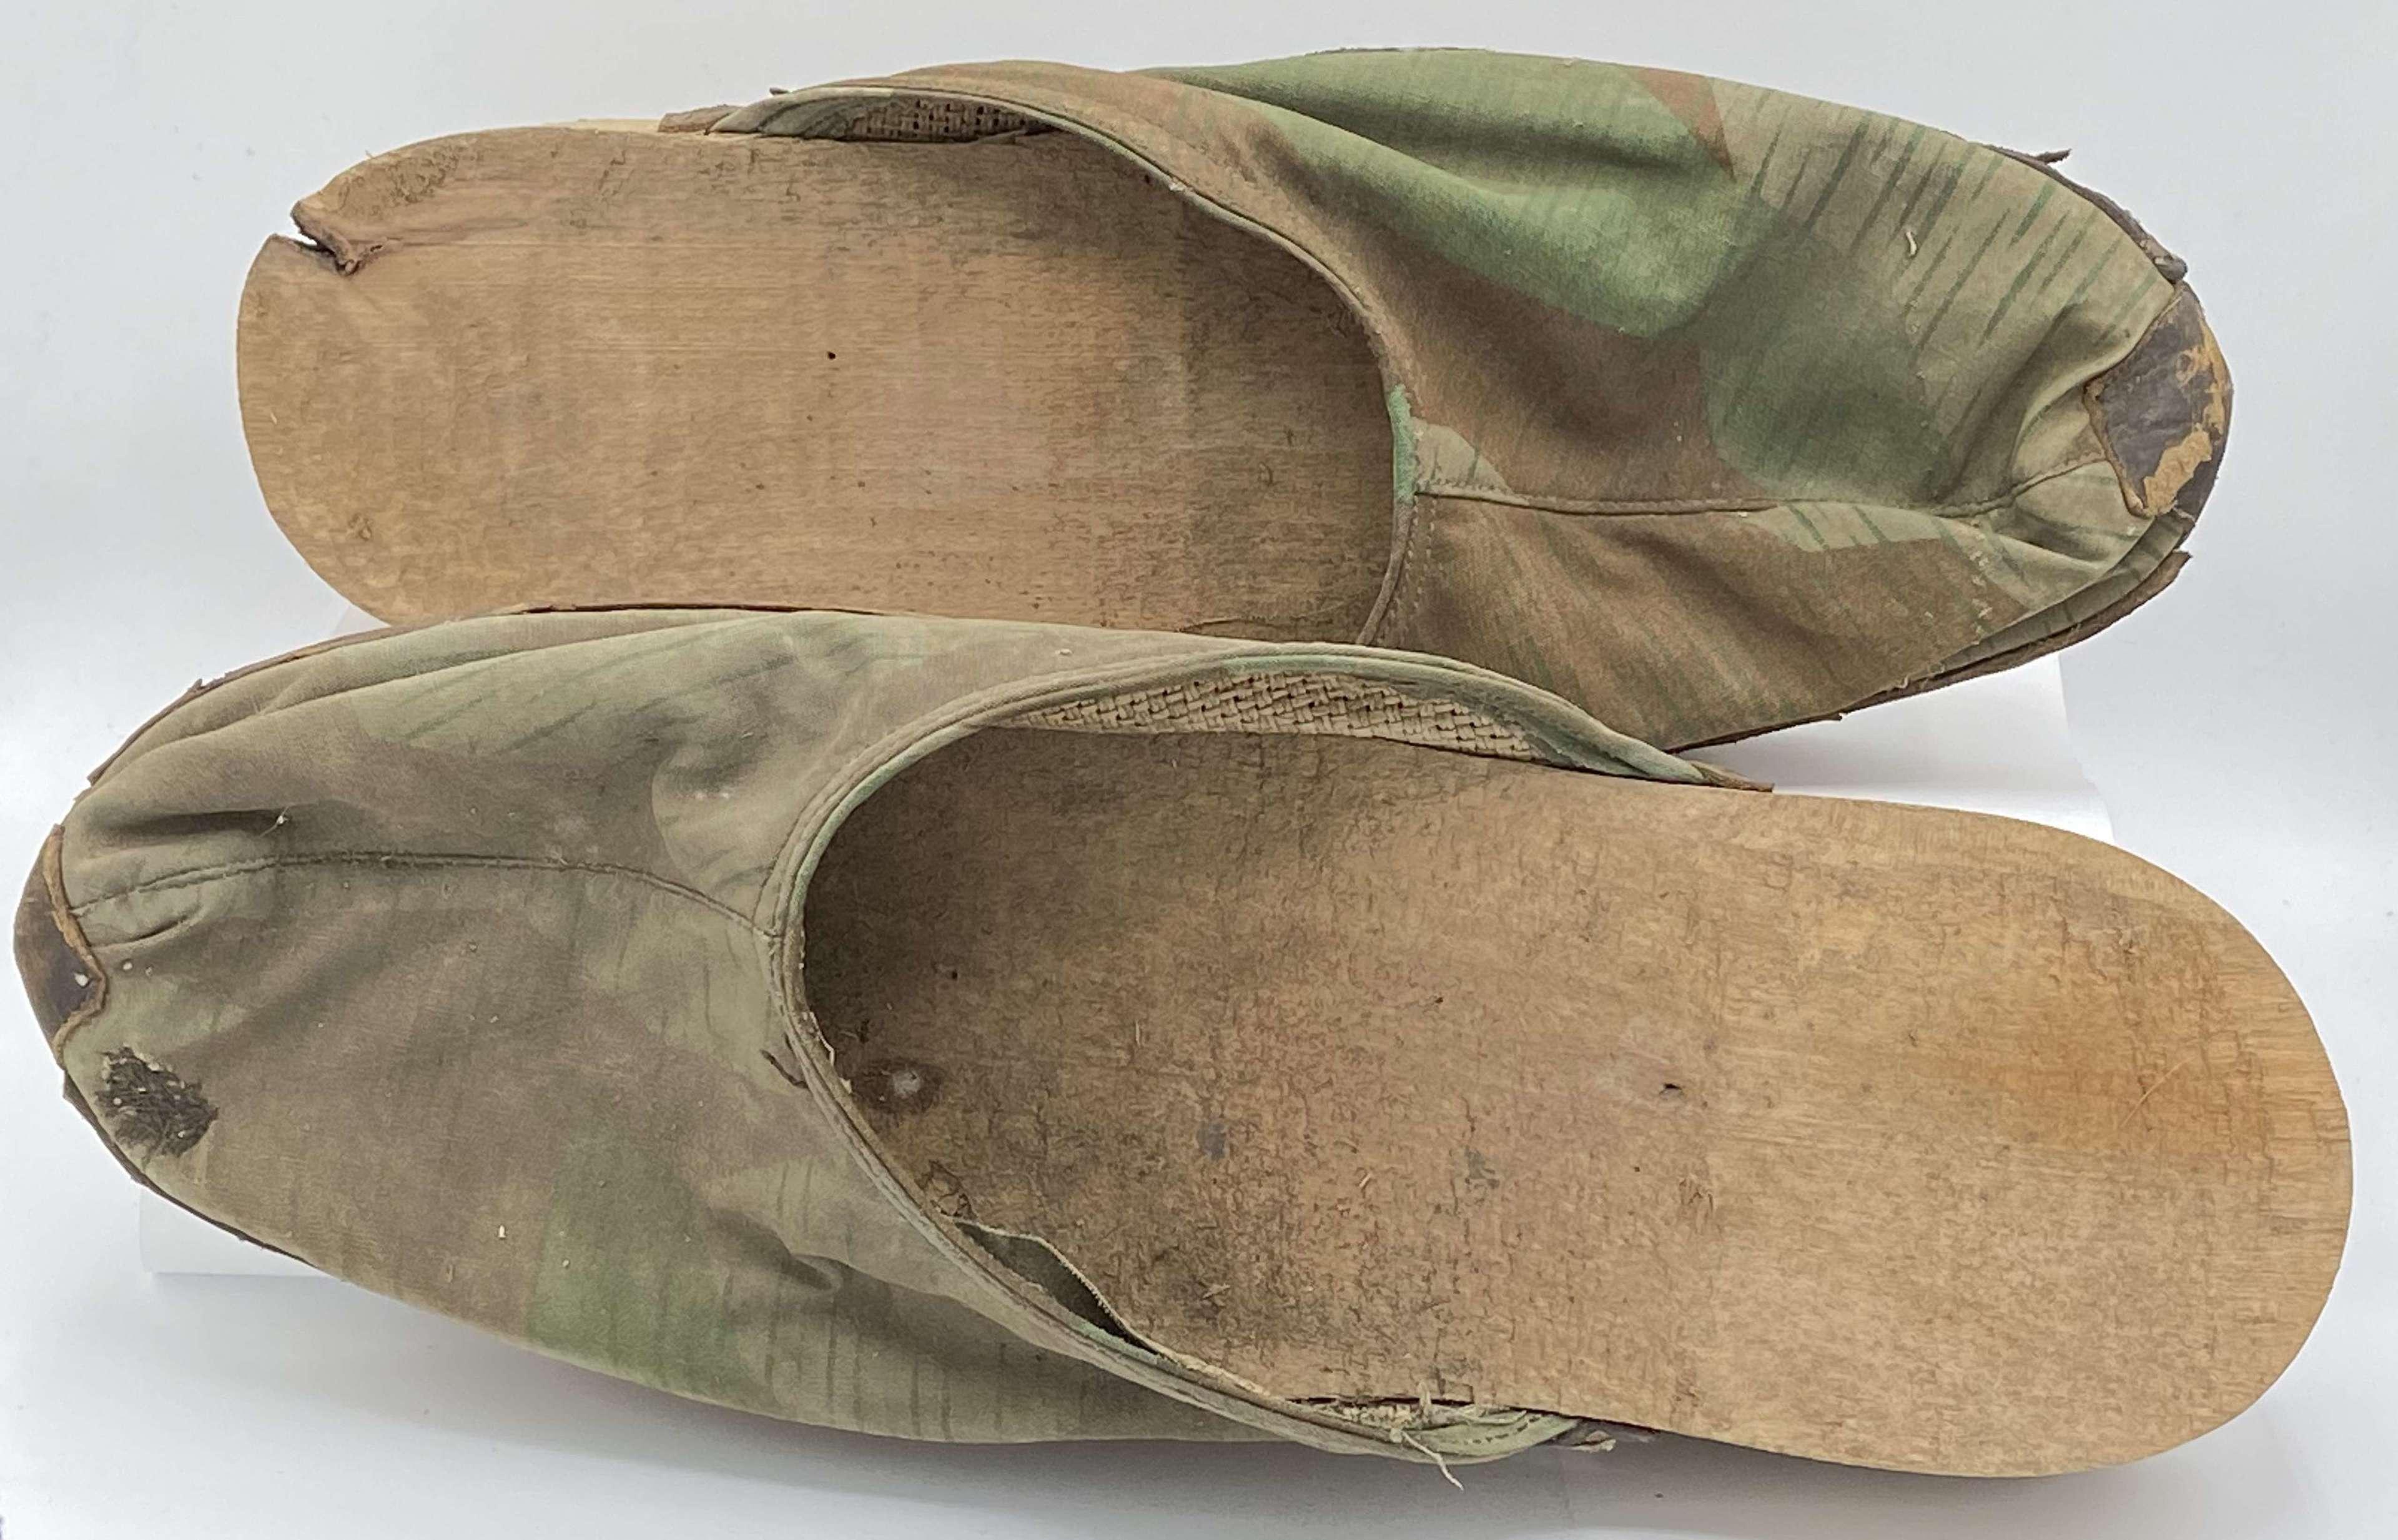 WW2 German Handmade unissued Concentration Camp KZ Reichenau Shoes